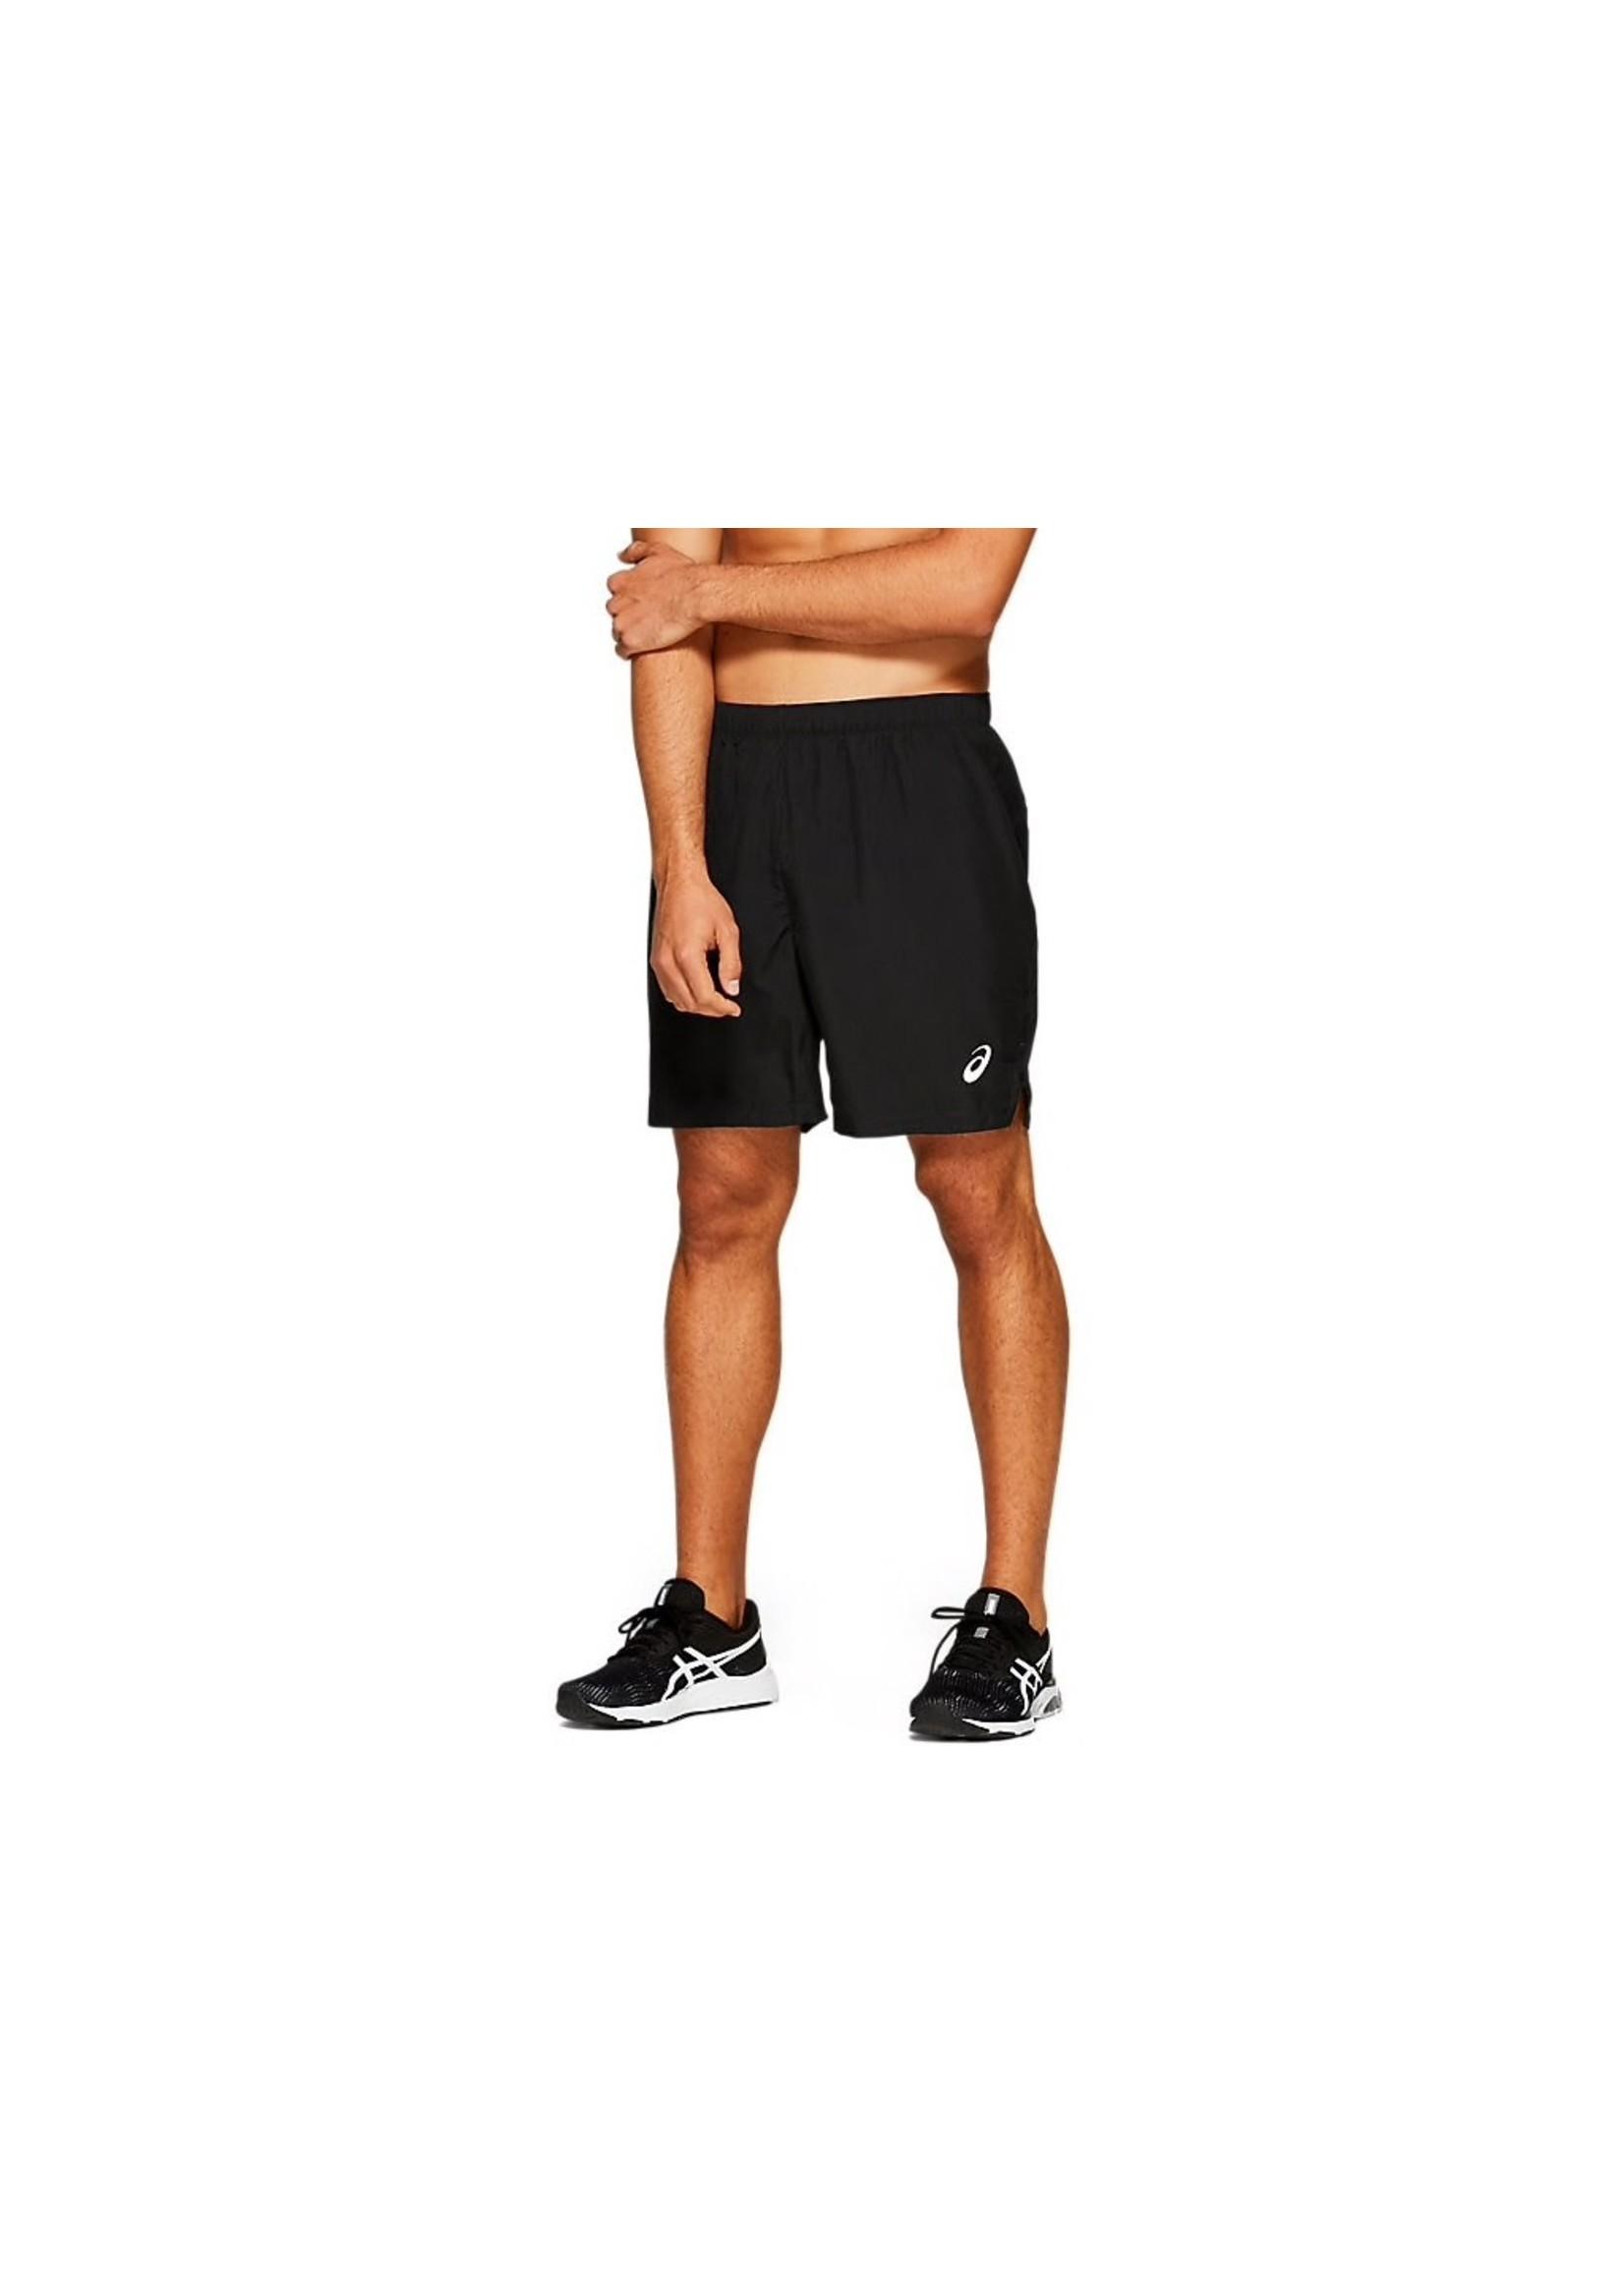 Asics Asics Mens Silver 7in Running Short,Performance Black